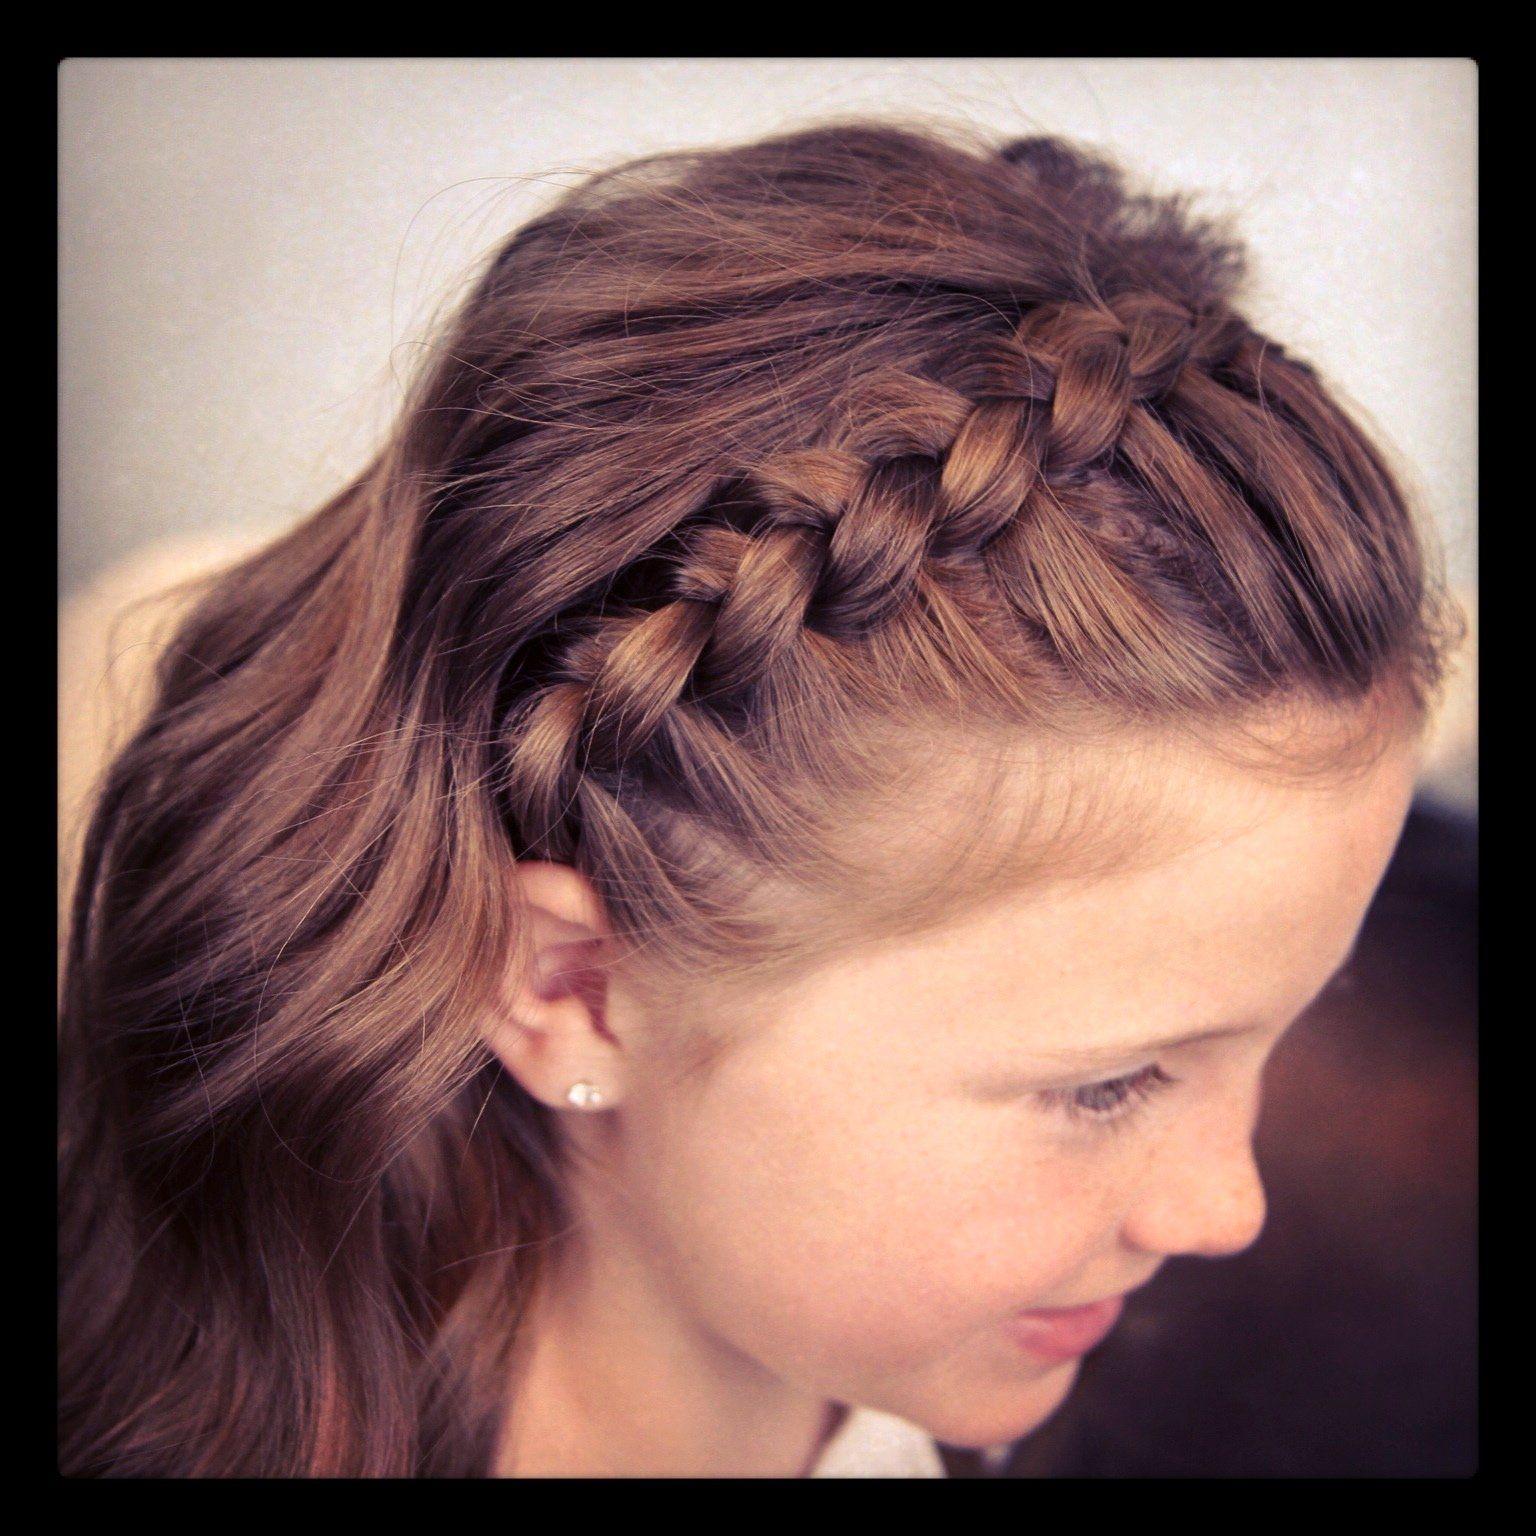 braid headbands | cute girls hairstyles | нαιя | hair styles